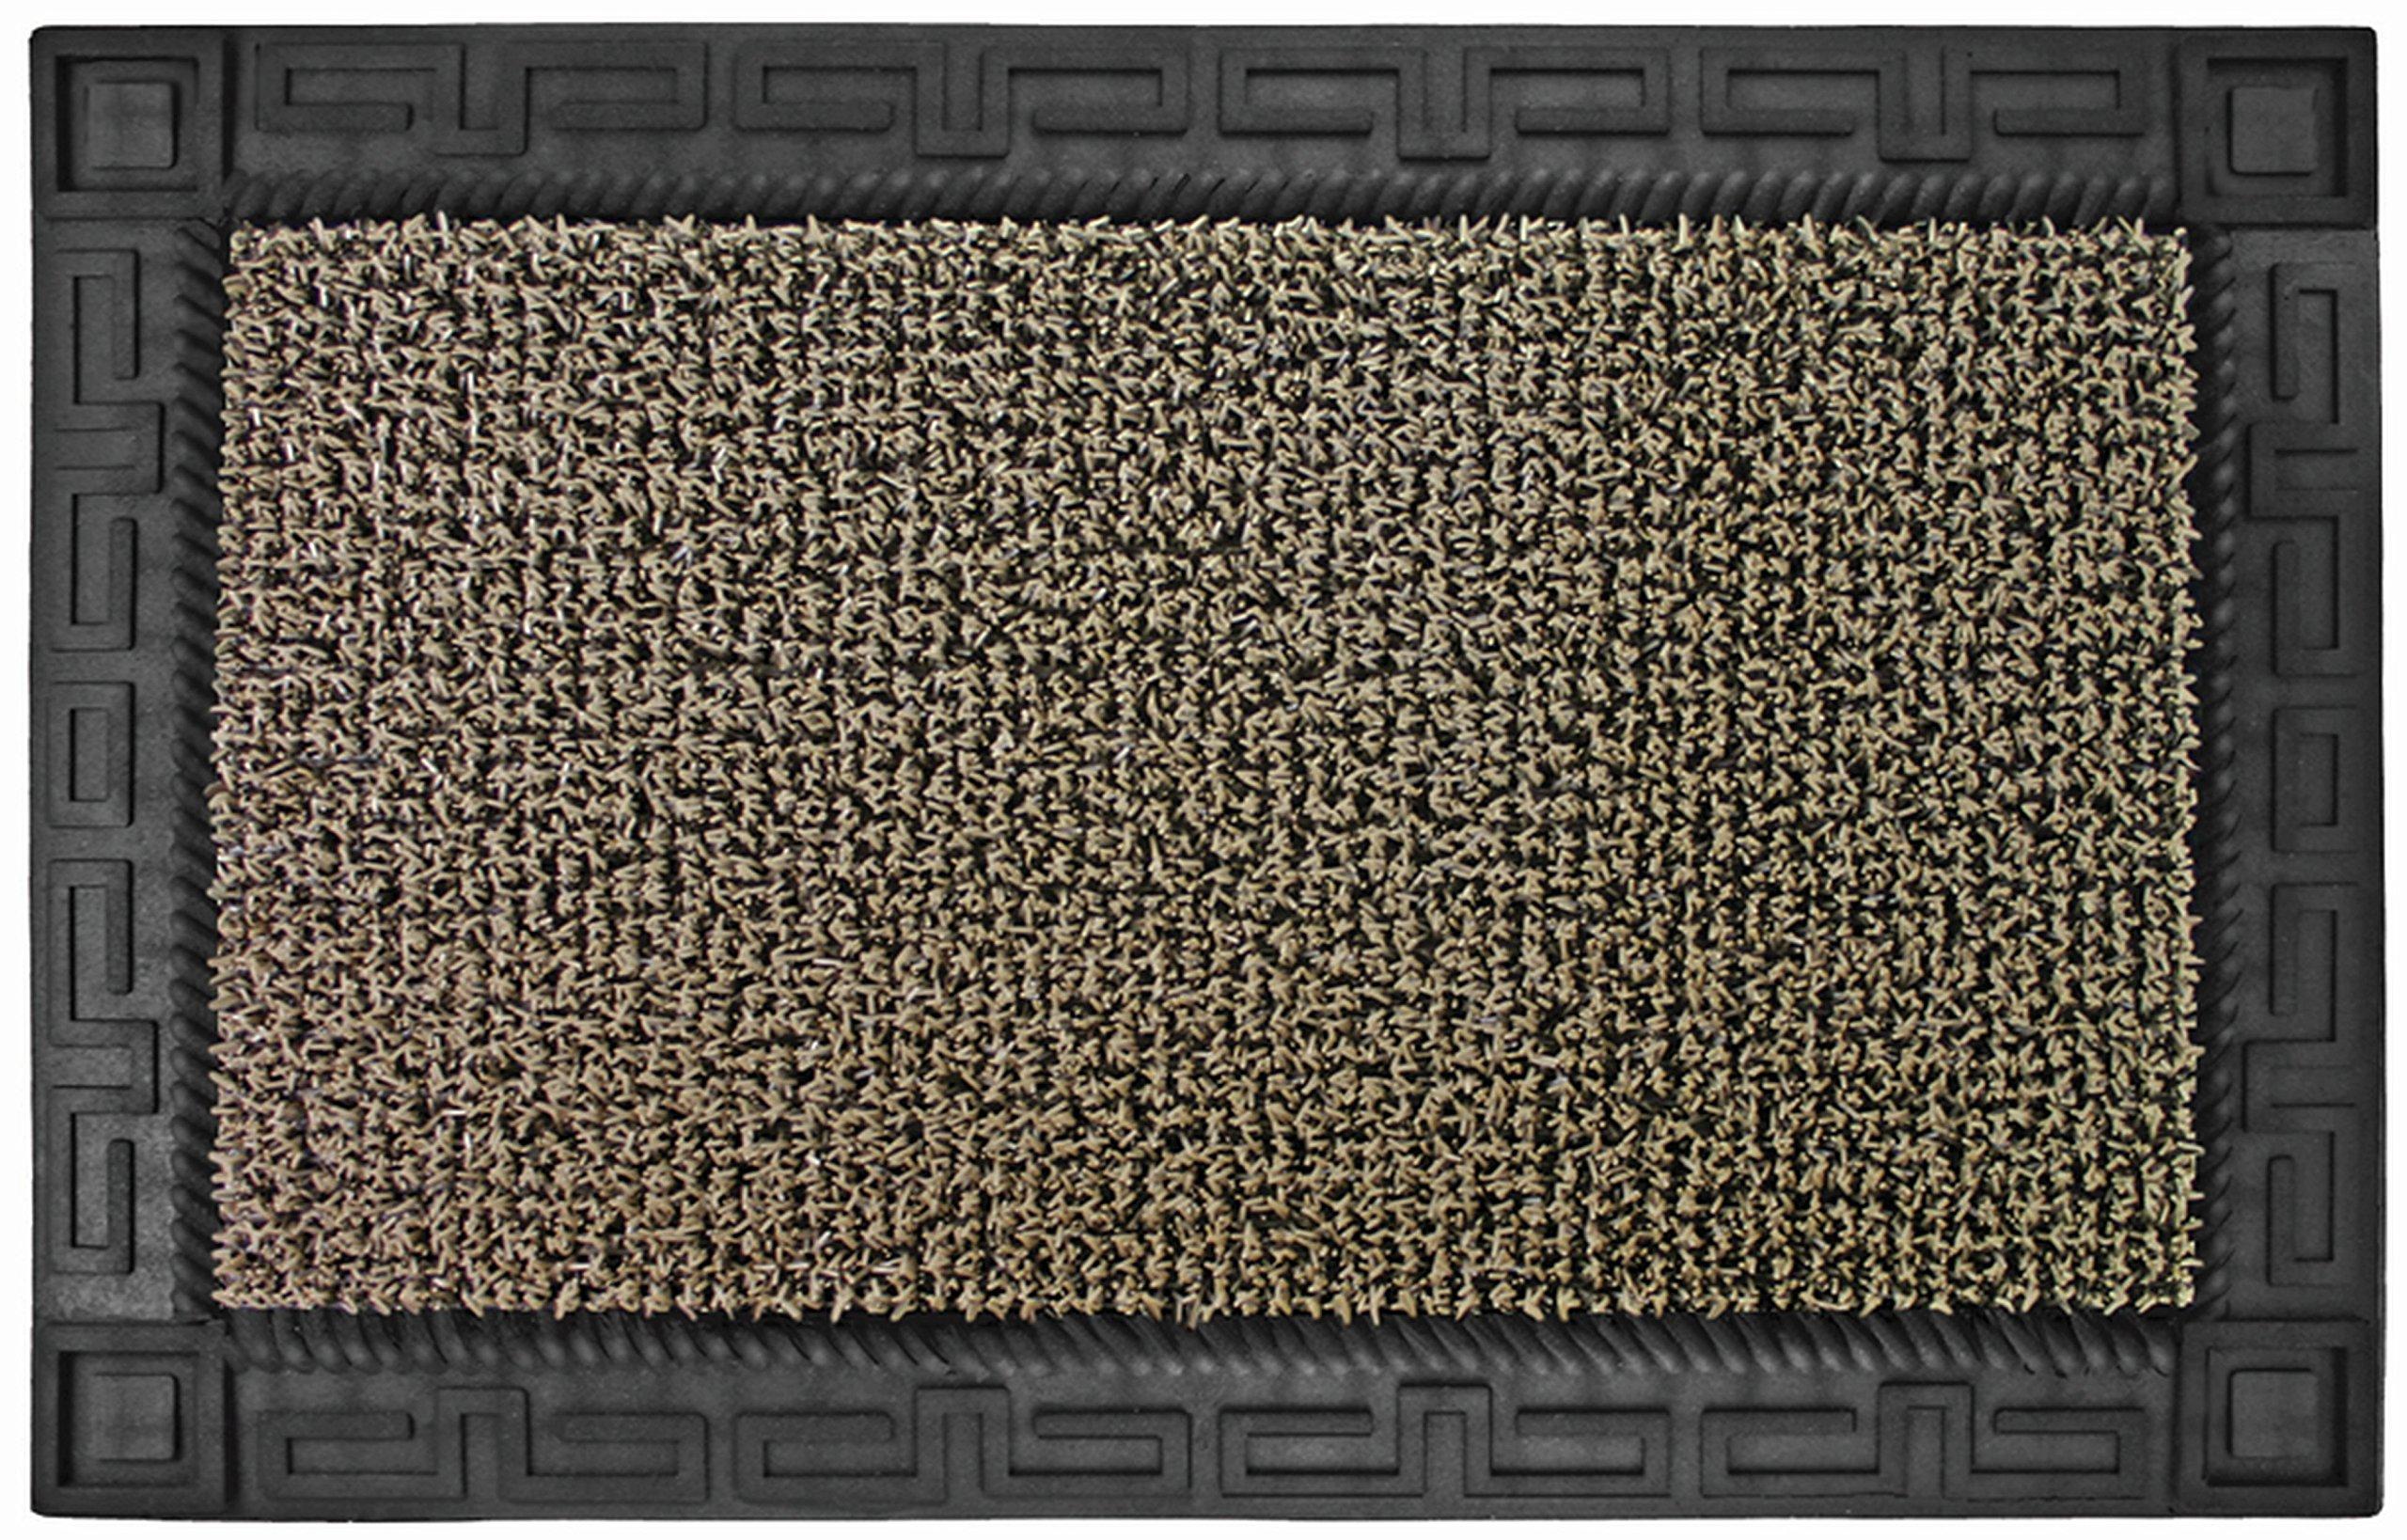 Grassworx Clean Machine Omega Doormat, 24'' x 36'', Earth Taupe (10374063) by Grassworx